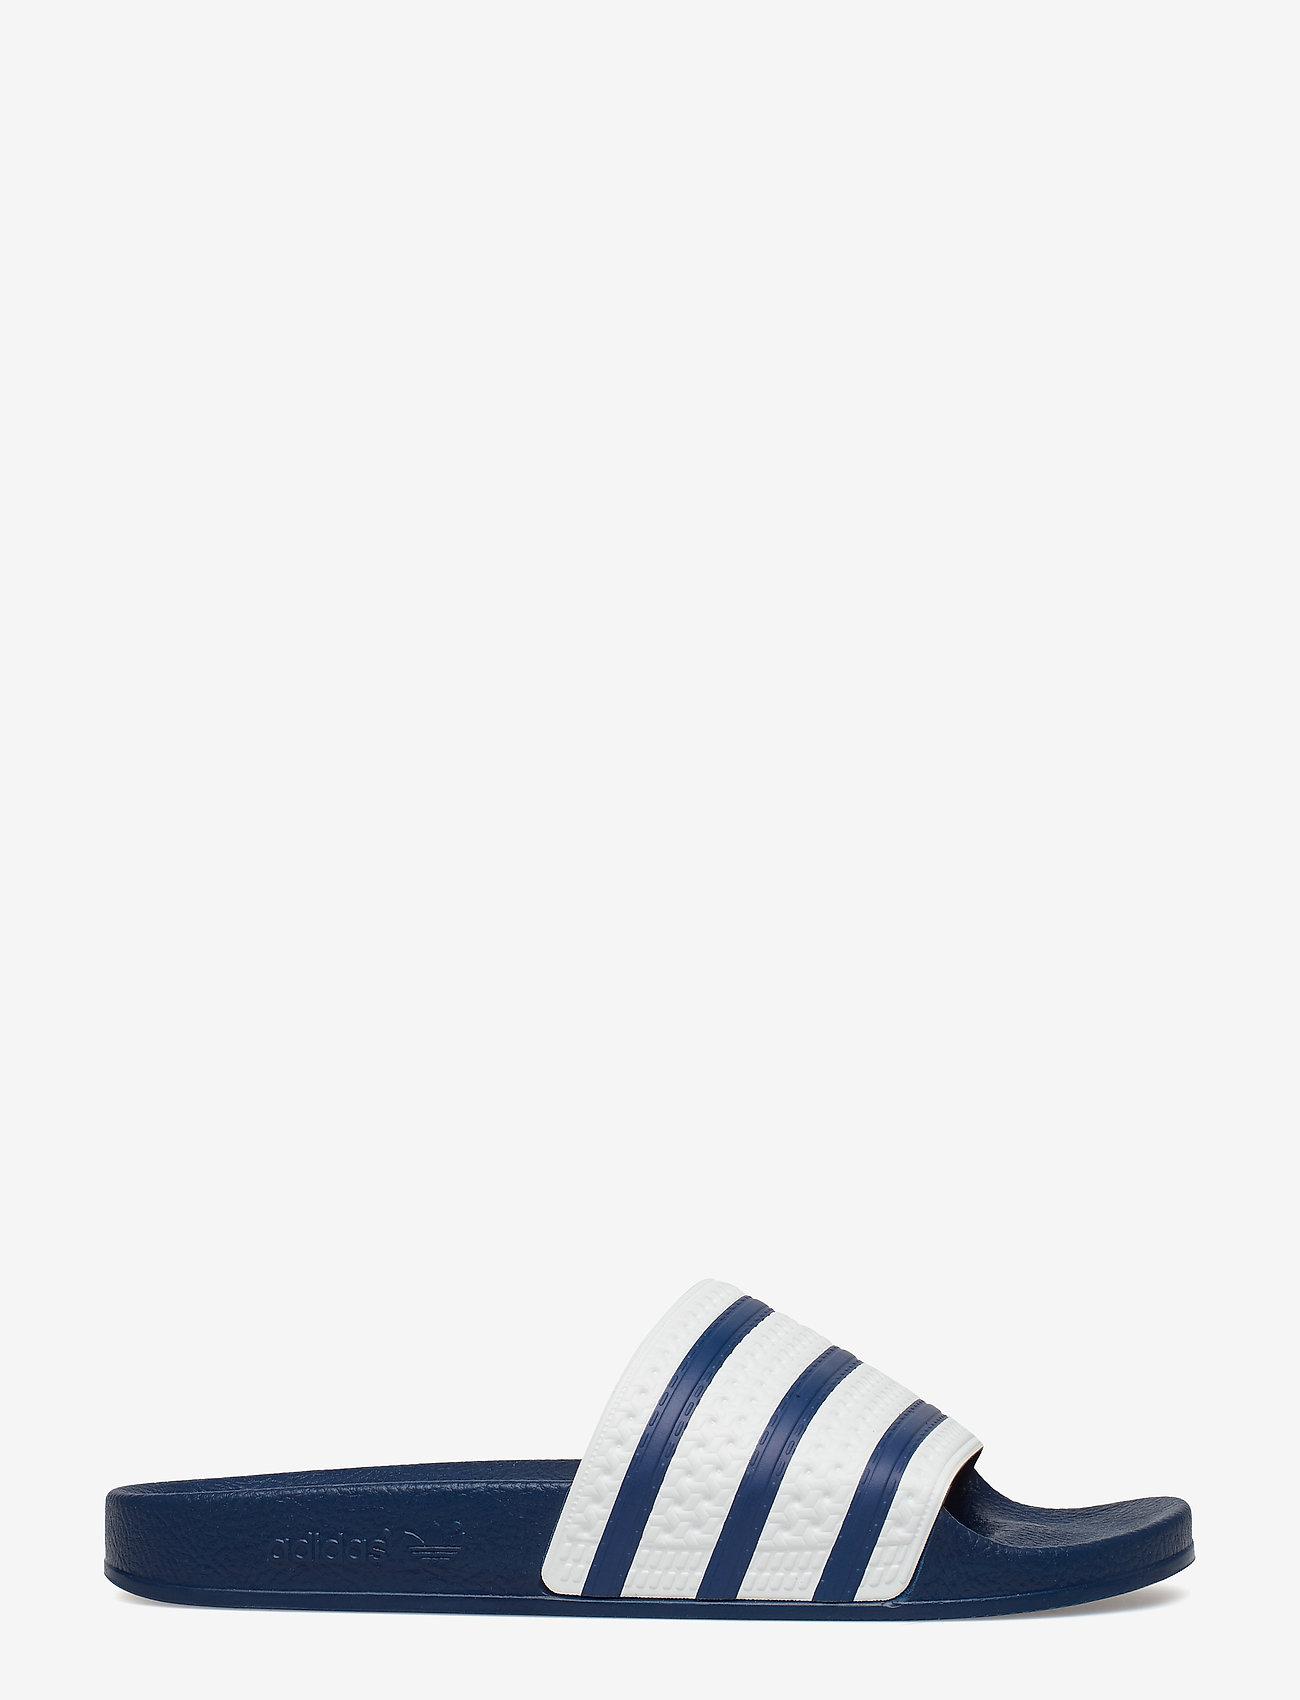 adidas Originals - ADILETTE - tennarit - adiblu/wht/adiblu - 1